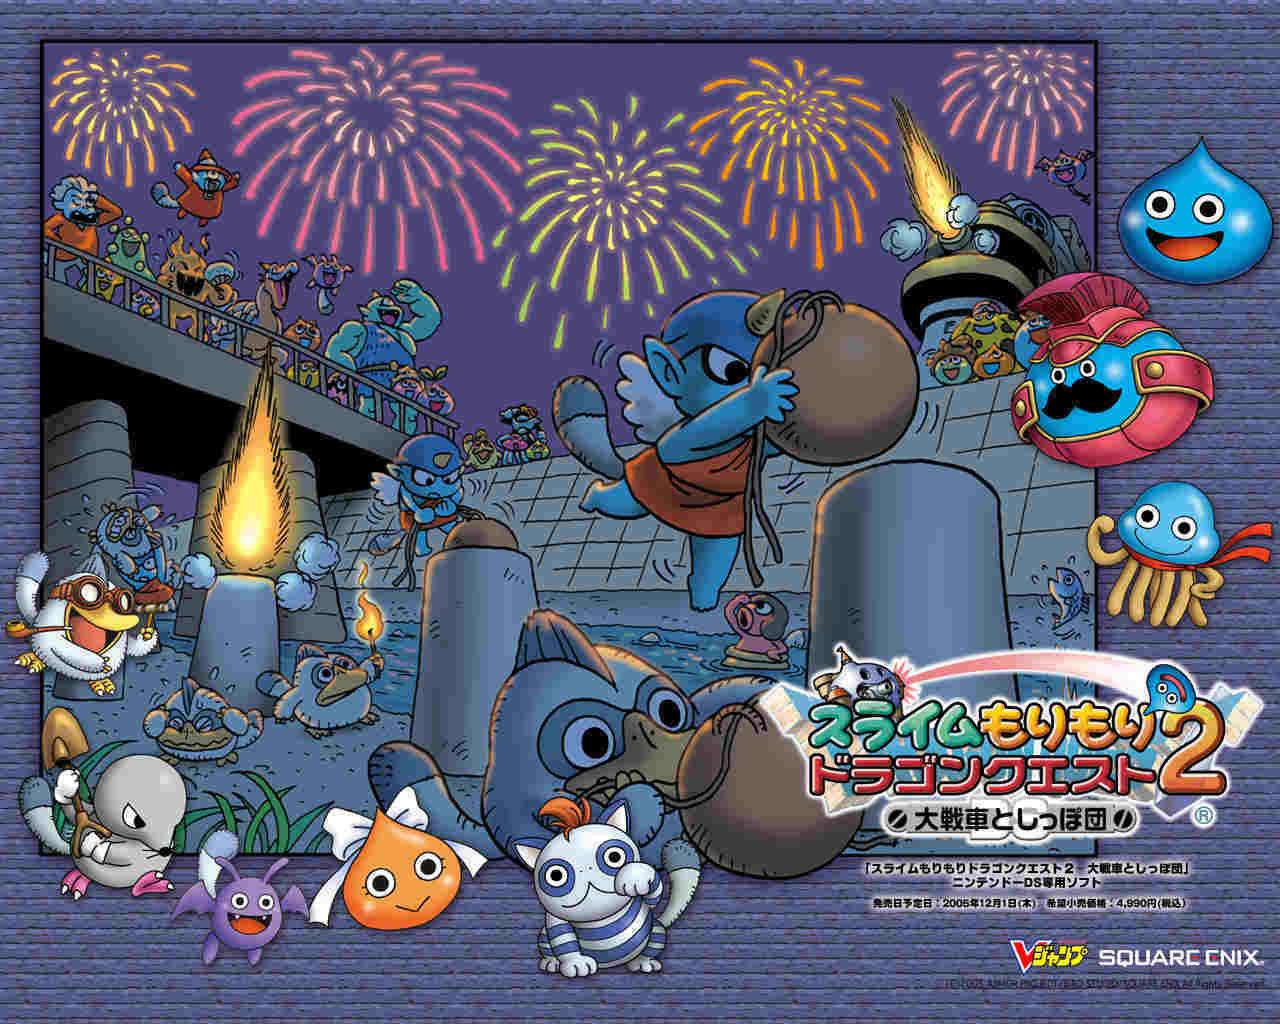 Dragon Quest Monsters Dragon Quest 壁紙 7130975 ファンポップ